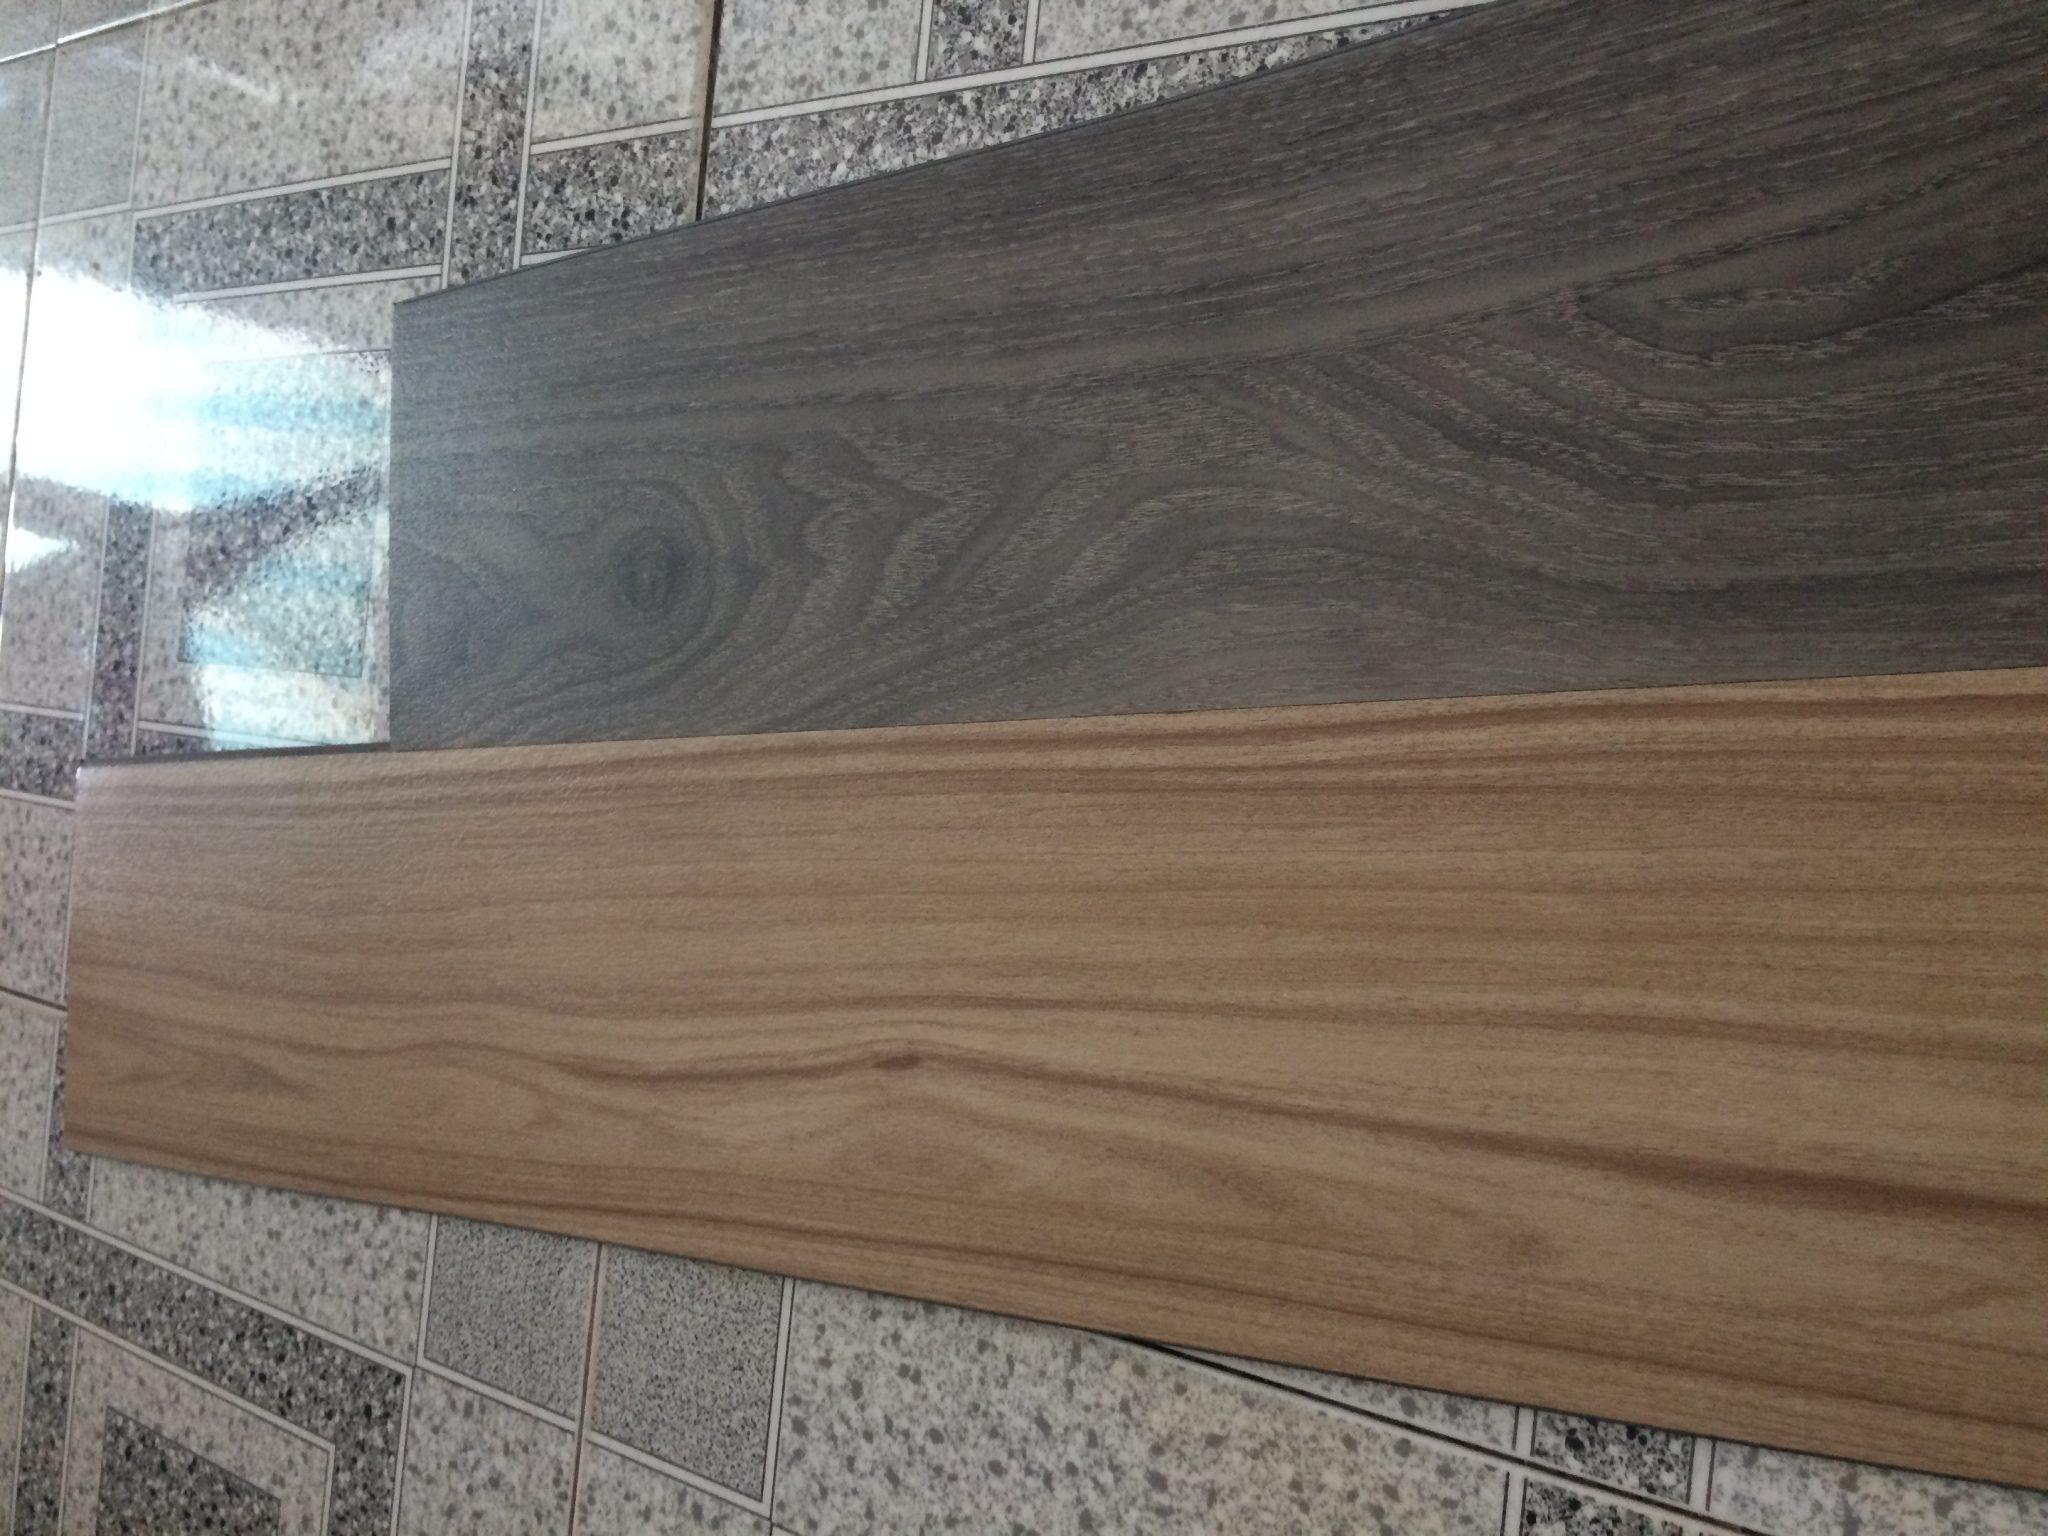 sàn nhựa hèm khóa vân gỗ